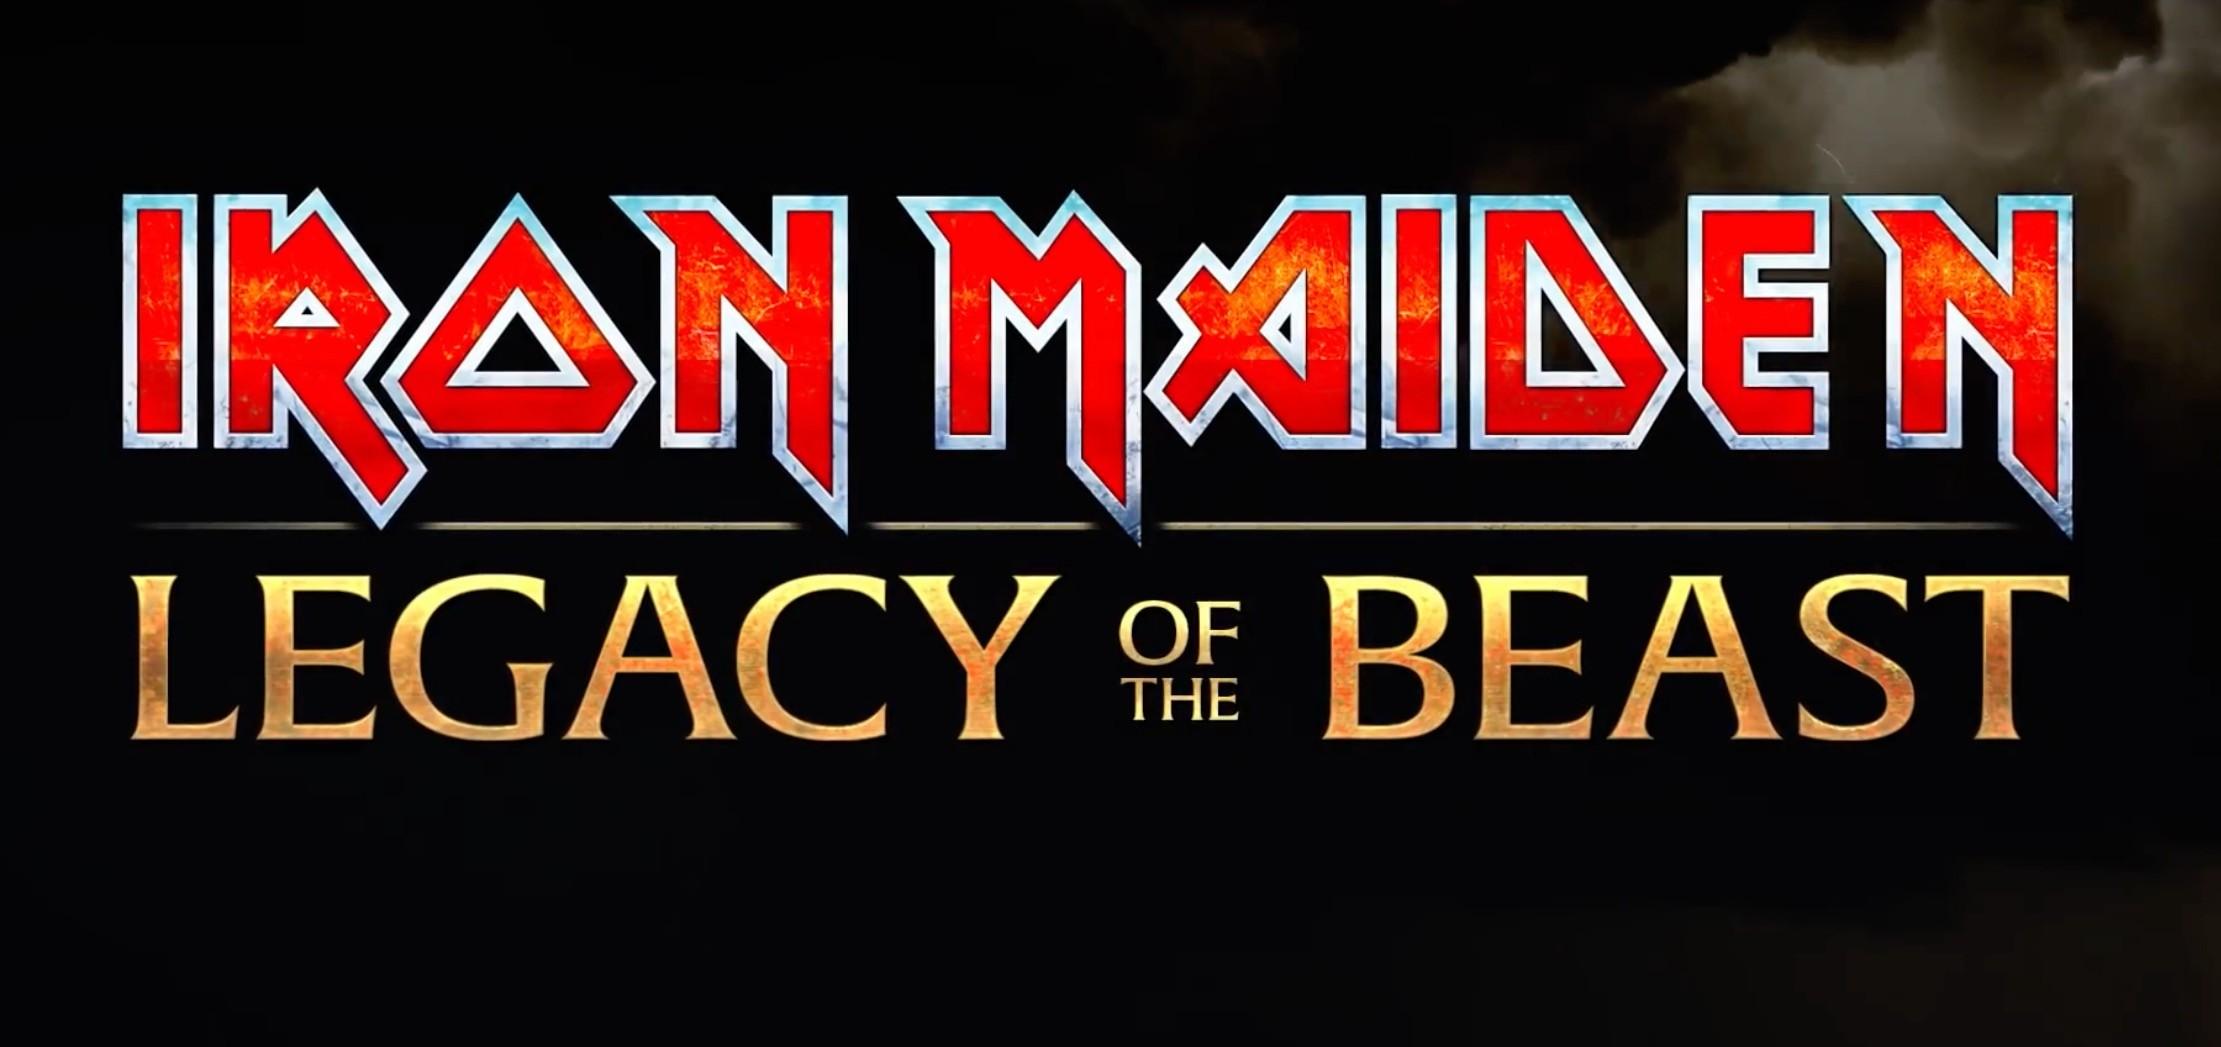 Iron Maiden wird nächster Stern Pinball - Legacy of the Beast - 2018